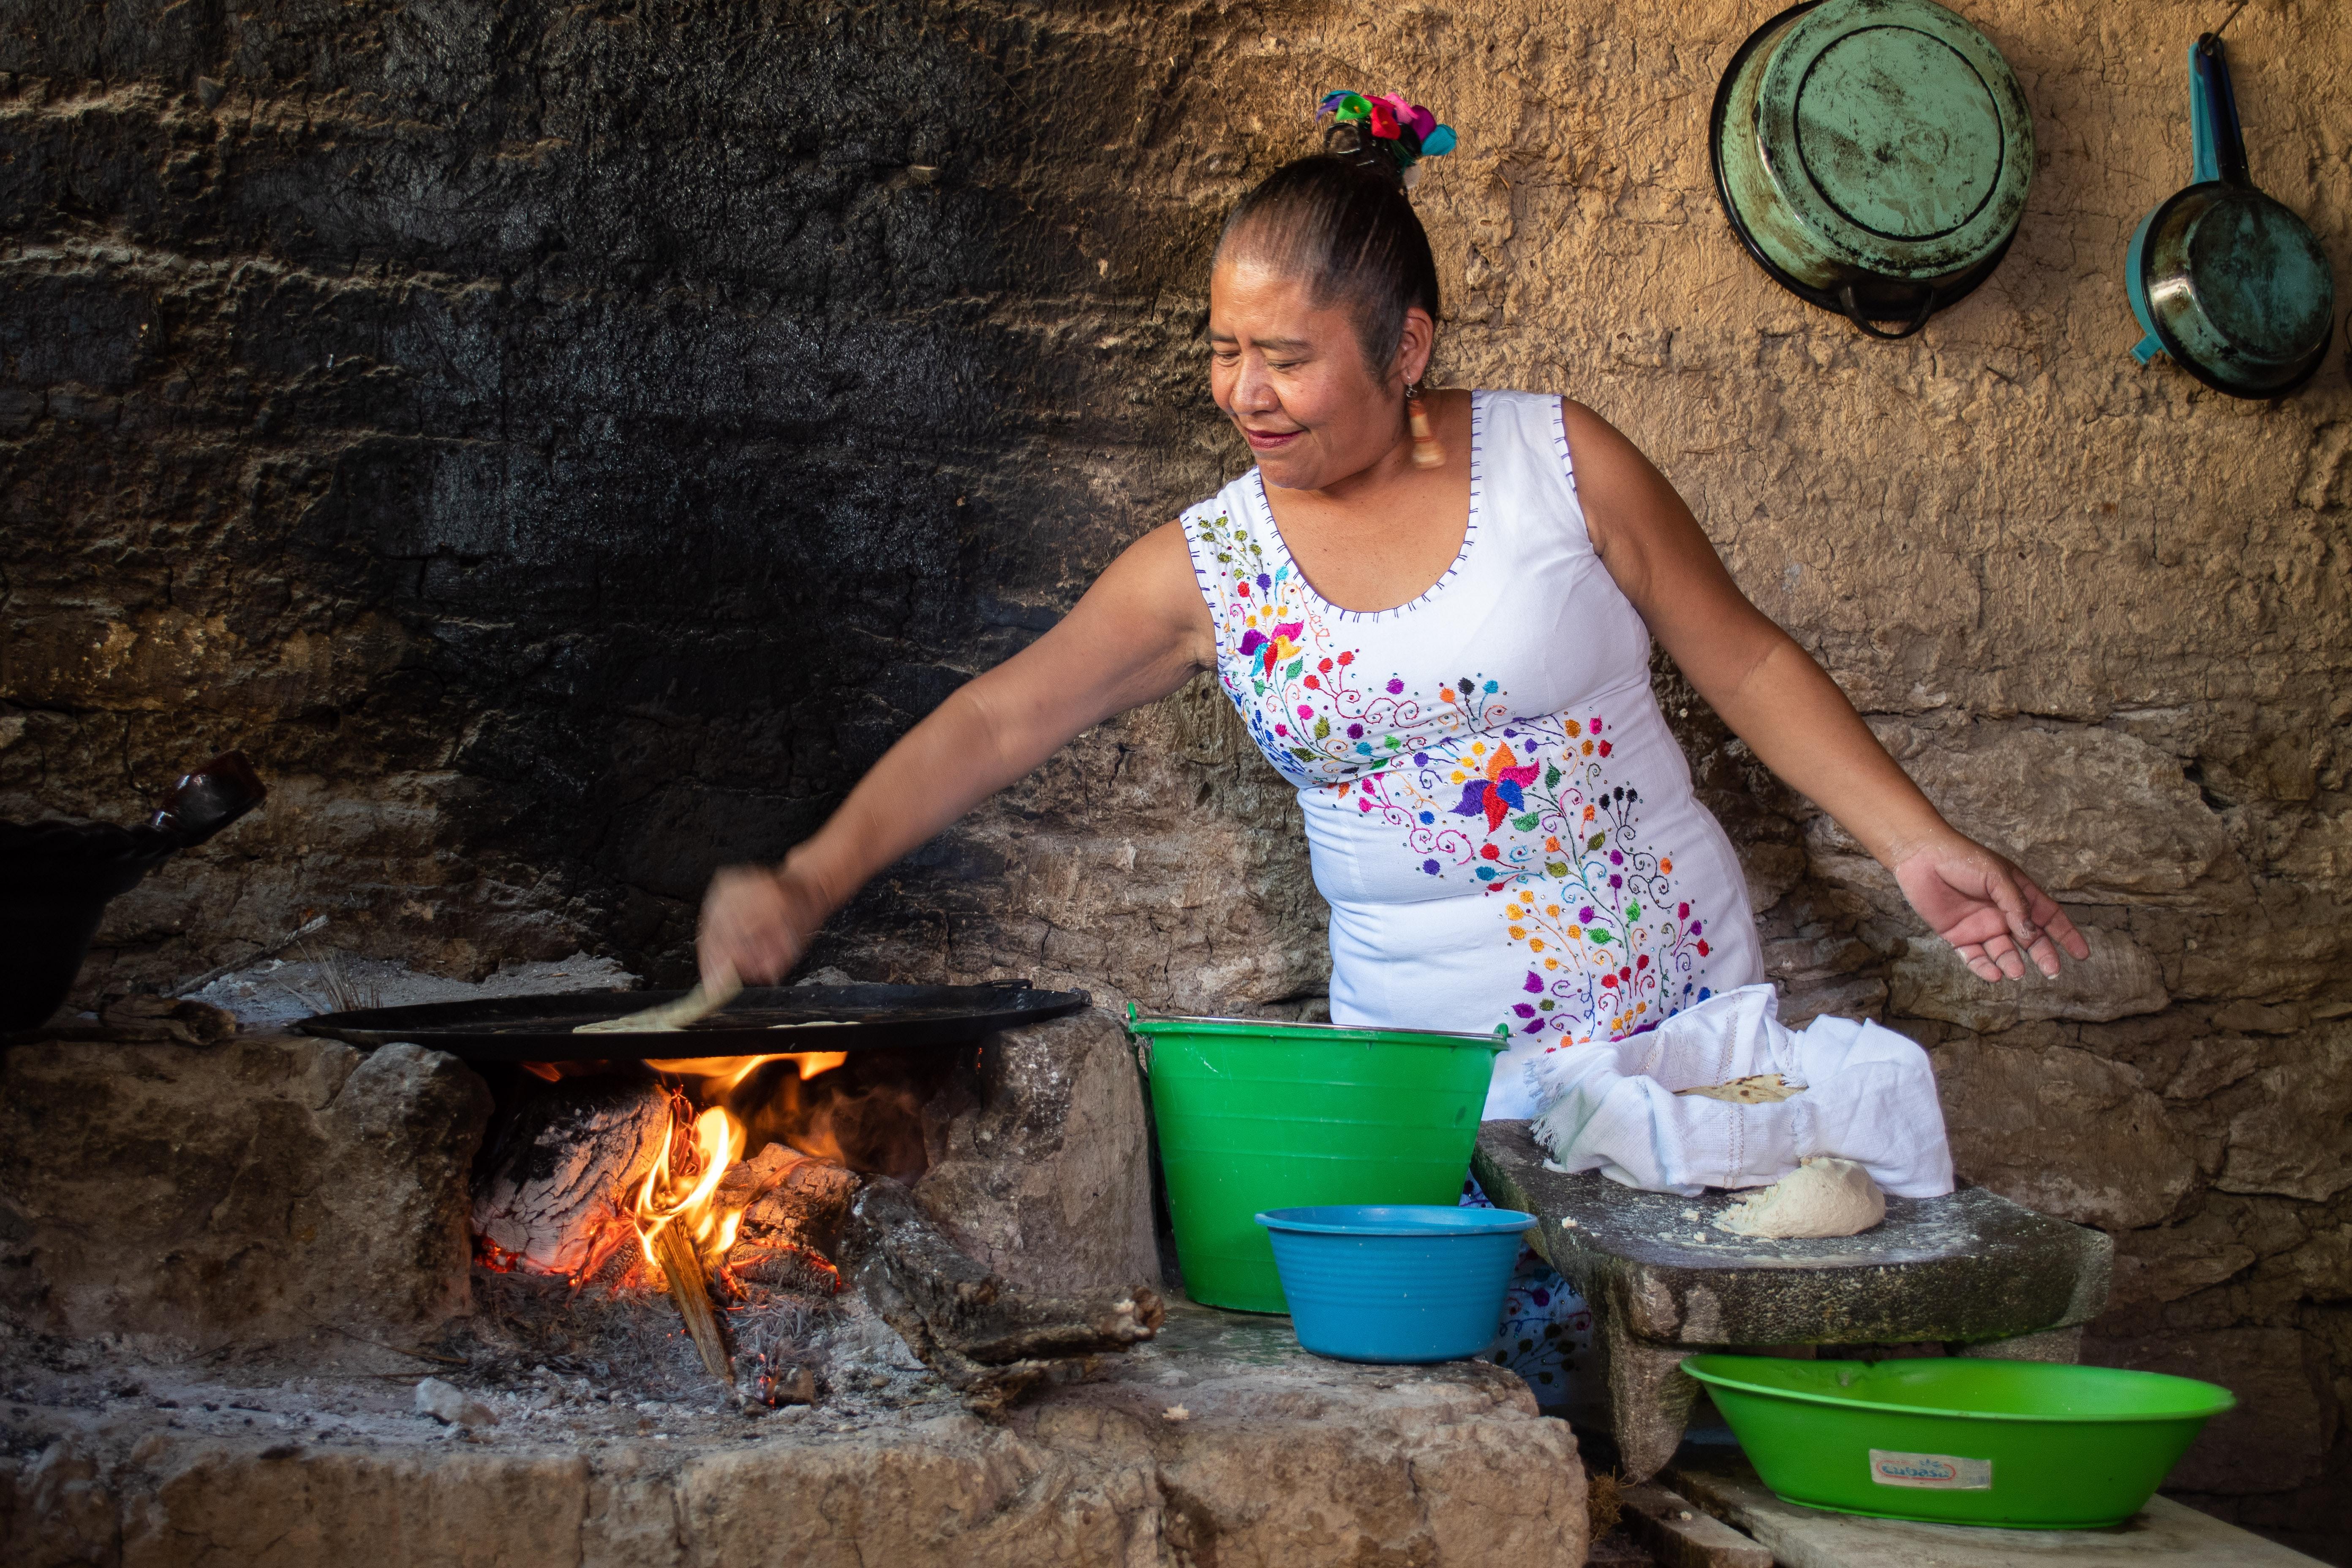 tierra-latina-voyage-mexique-chez-l-habitant-menu-acapulco-bw53DWzM8RI-unsplash